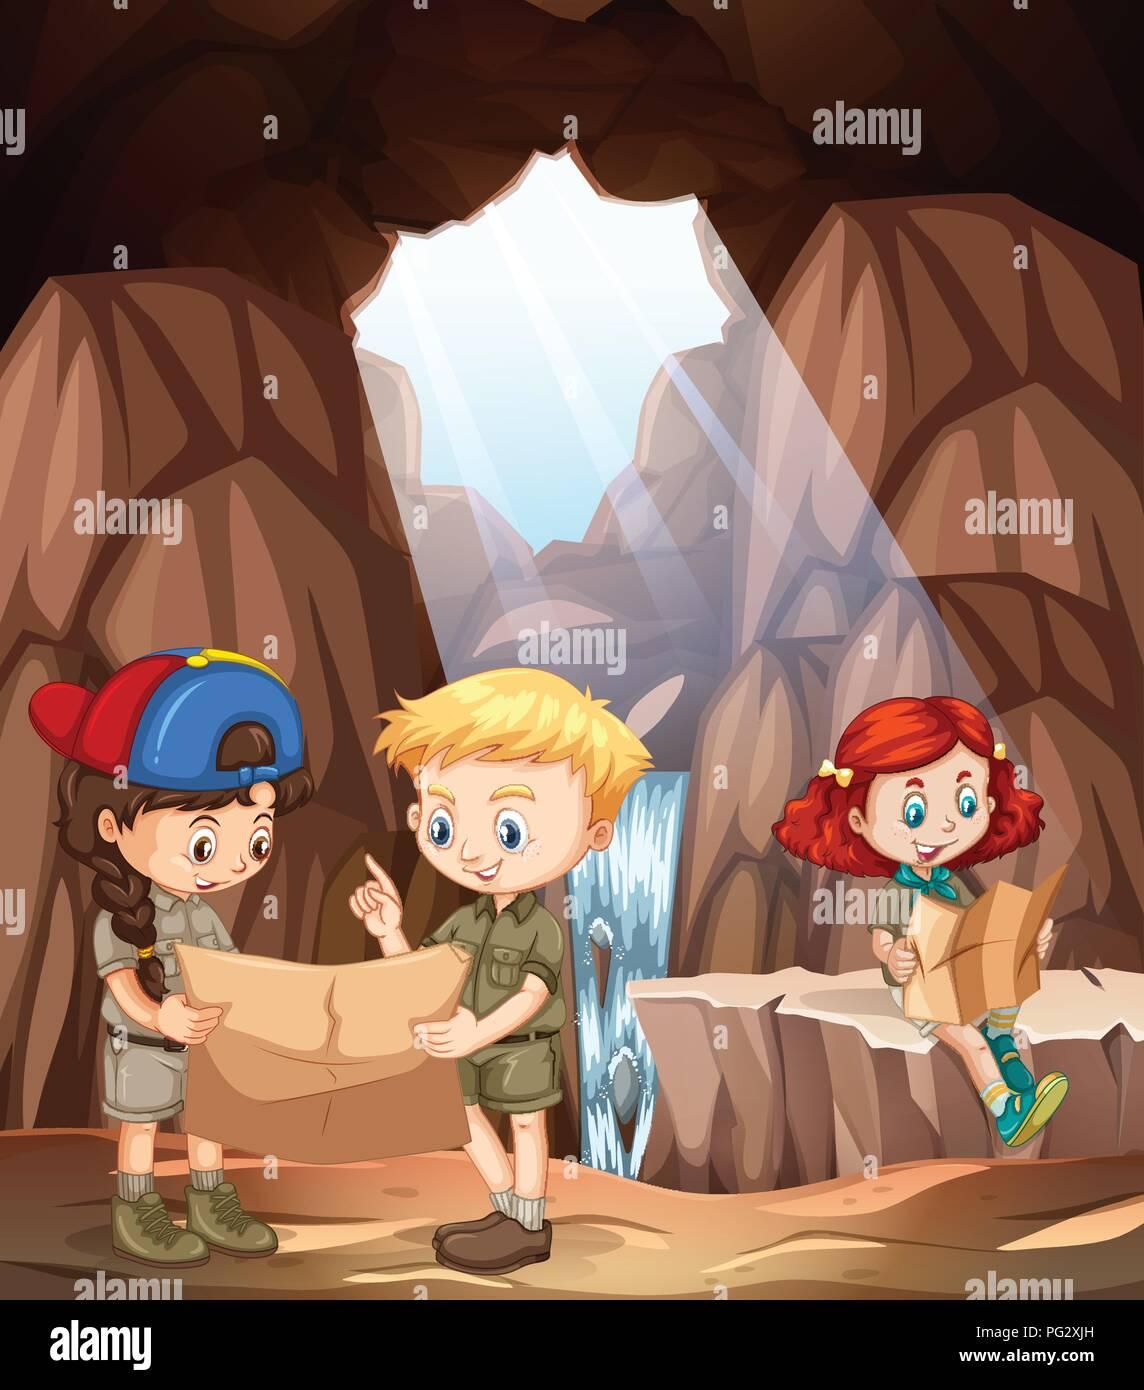 children exploring a cave illustration - Stock Vector